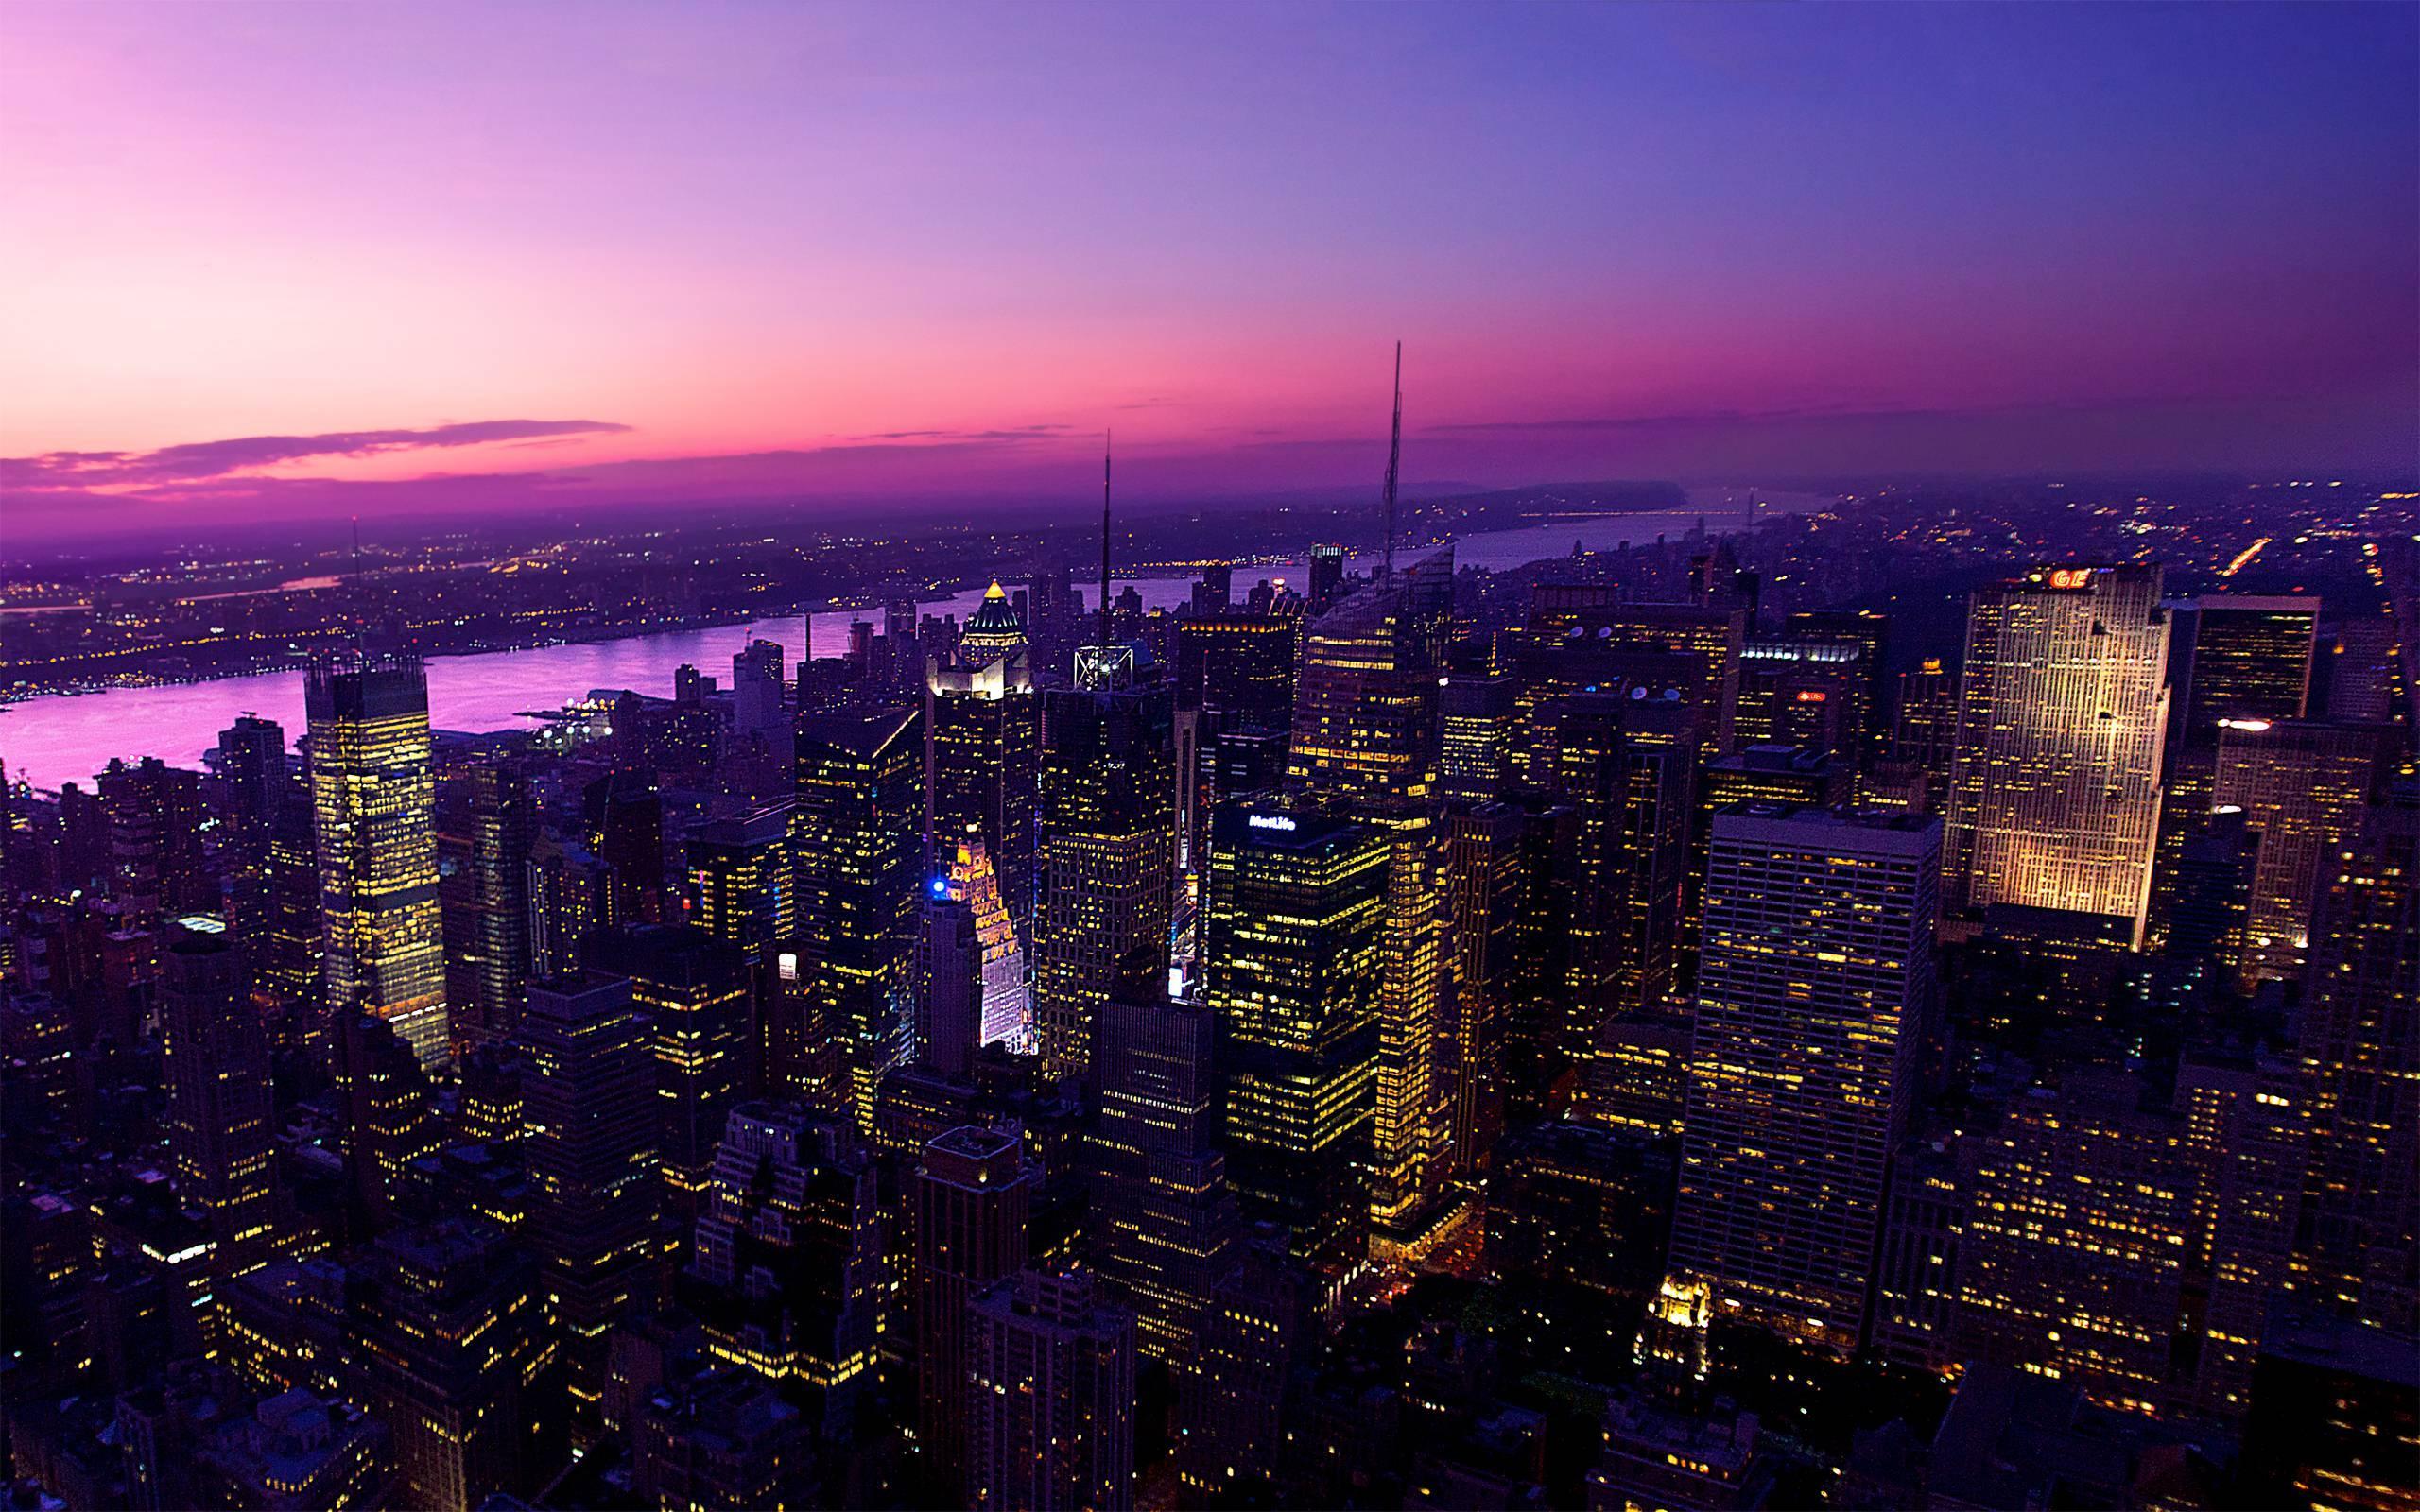 wallpaper : city, night, sunset, light 2560x1600 - mhd ferasalmousa